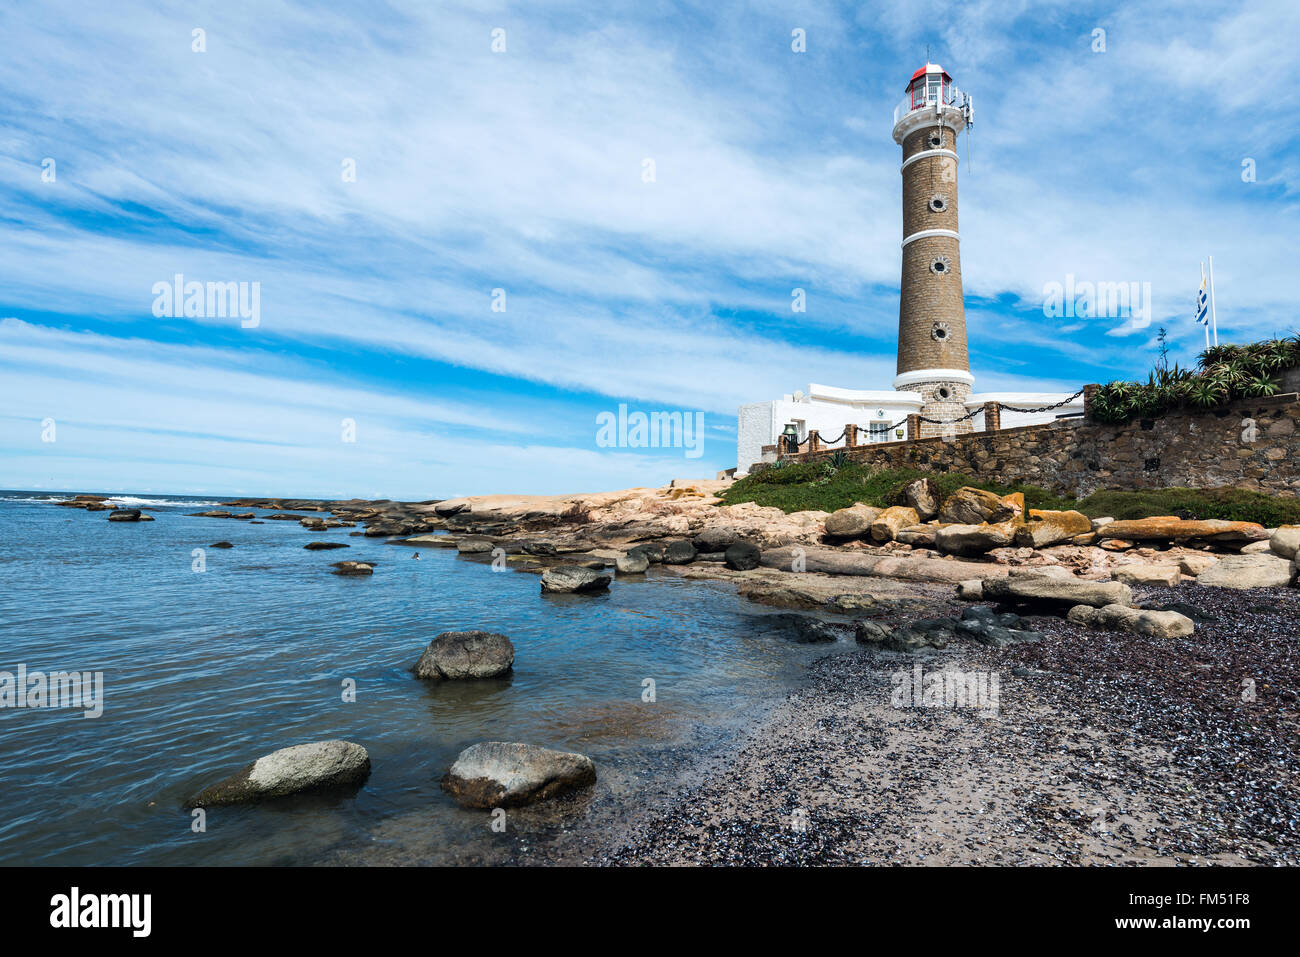 Phare de Jose Ignacio près de Punta del Este, Uruguay Photo Stock